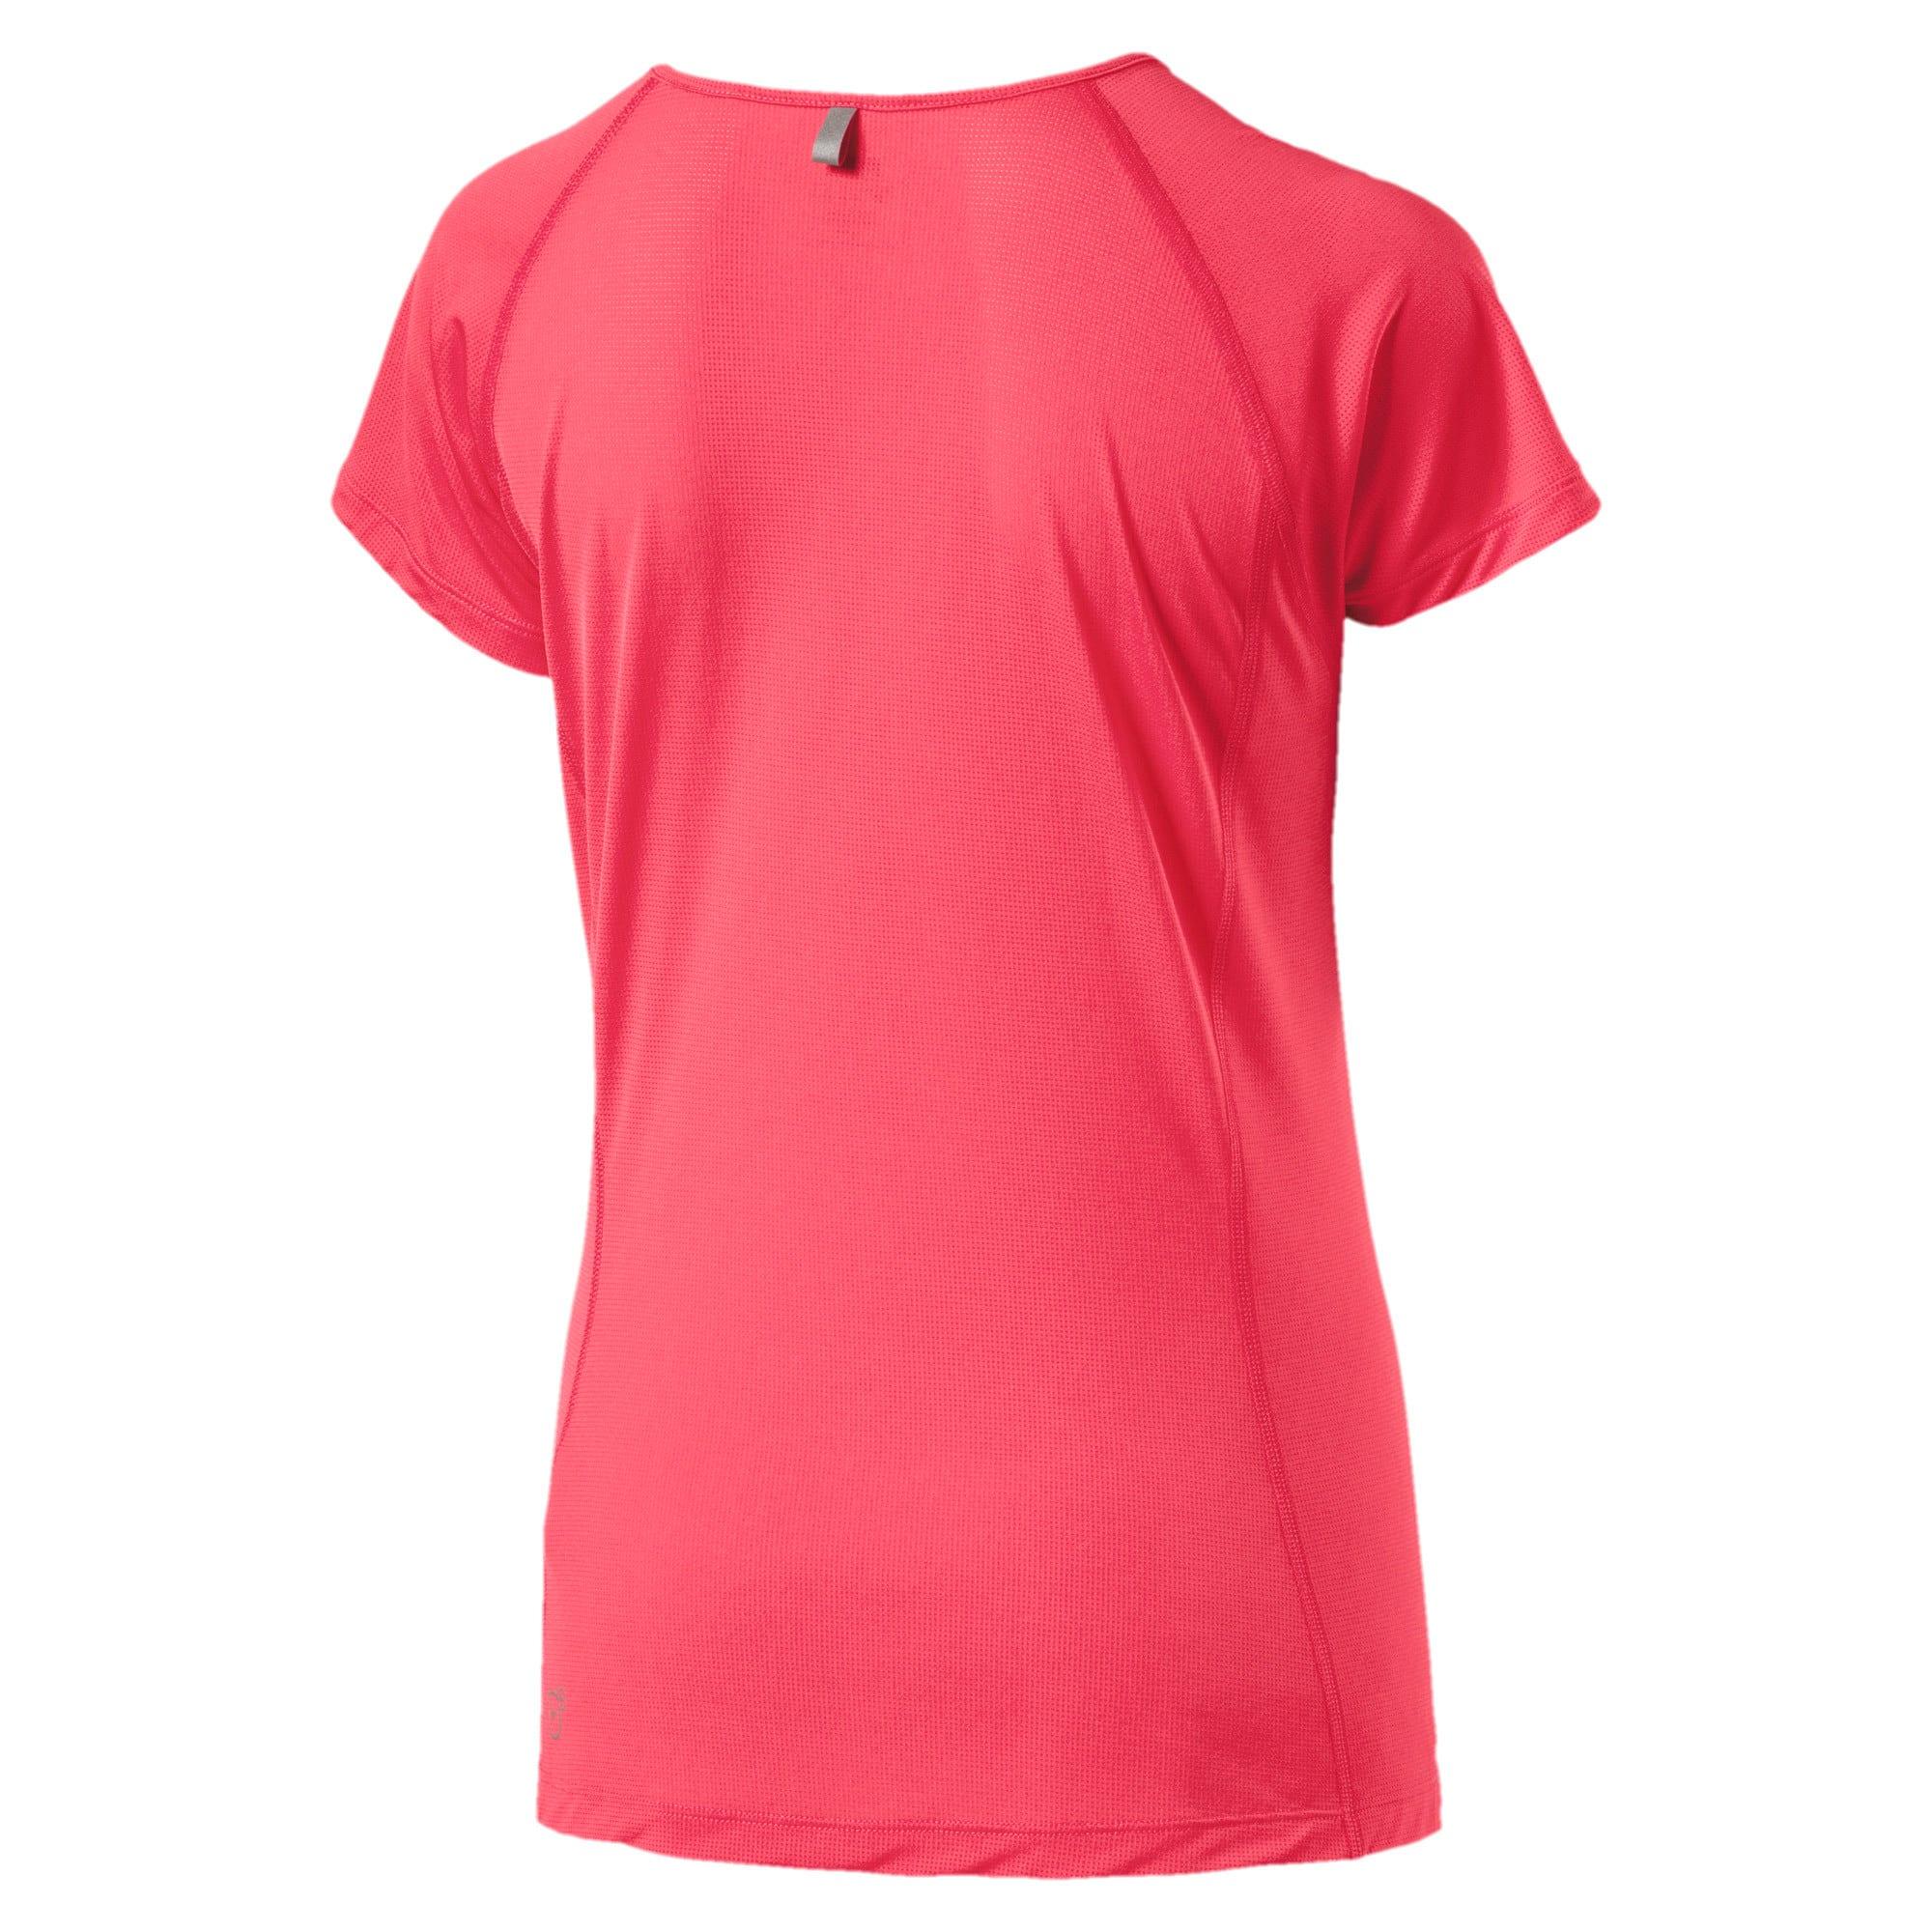 Thumbnail 5 of ADHM 2019 Core-Run Short Sleeve Women's T-Shirt, Paradise Pink, medium-IND